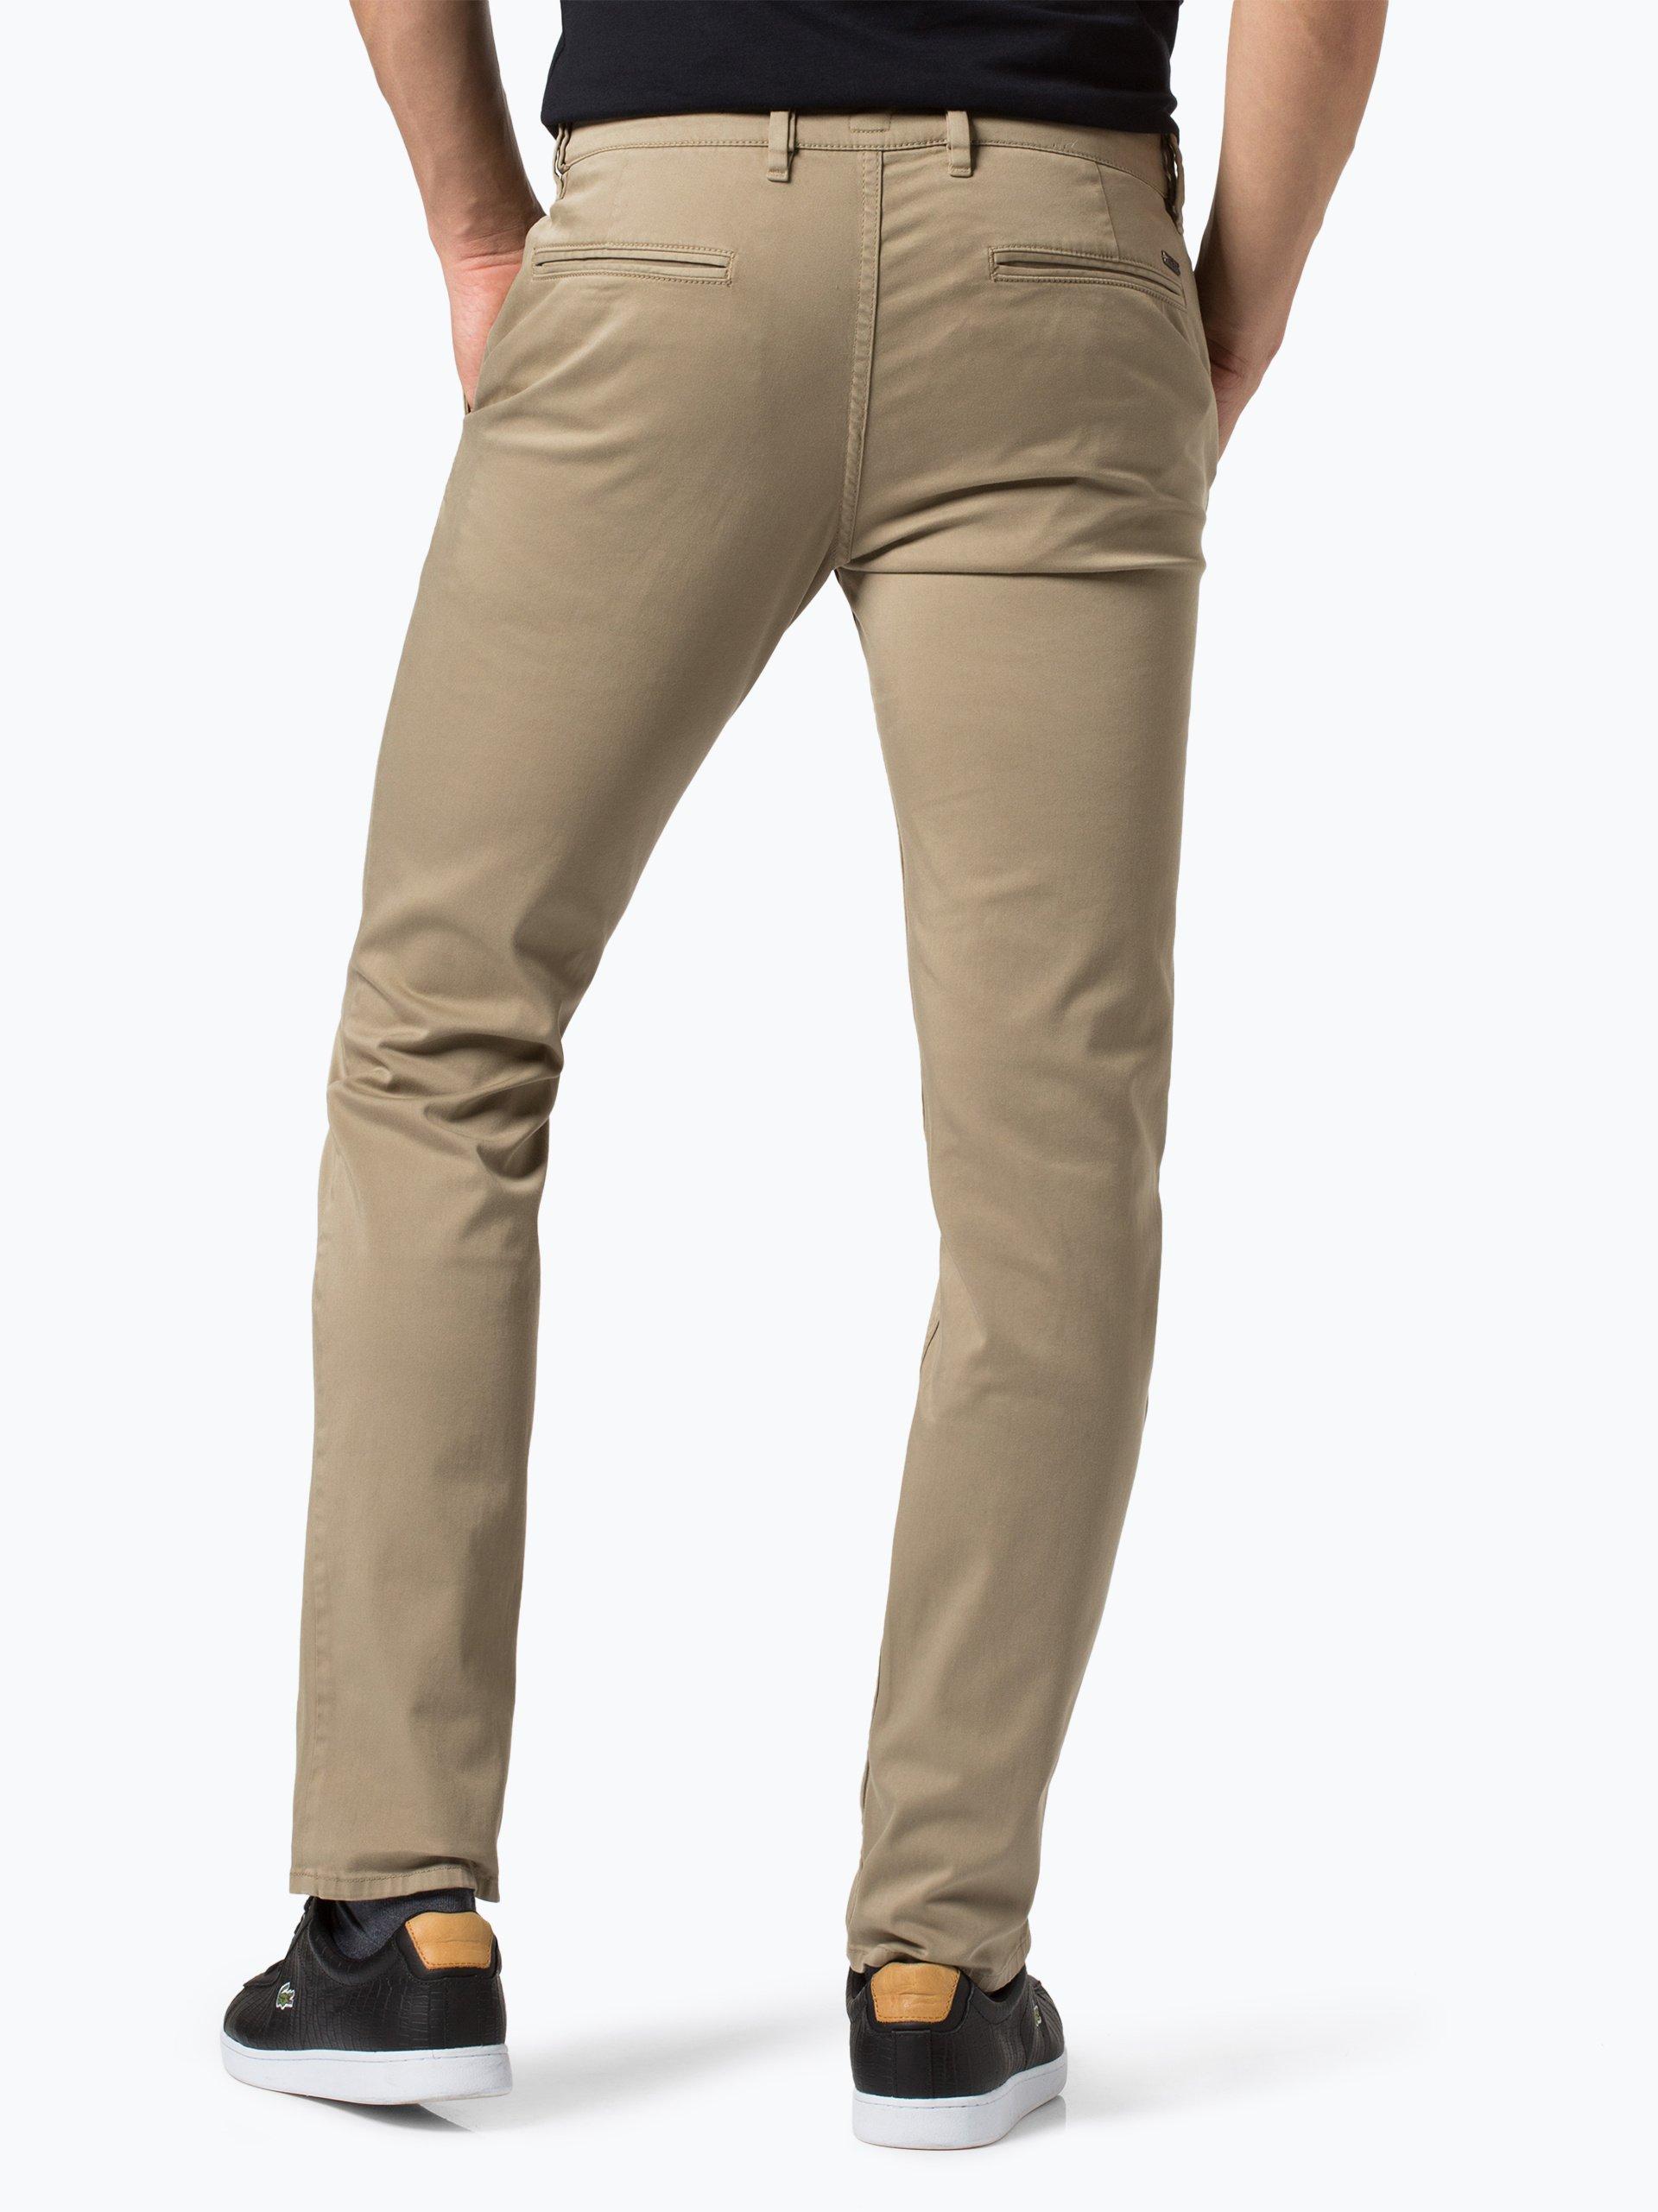 12ce2aed320e4 BOSS Casual Spodnie męskie – Schino-Slim1-D kup online | VANGRAAF.COM